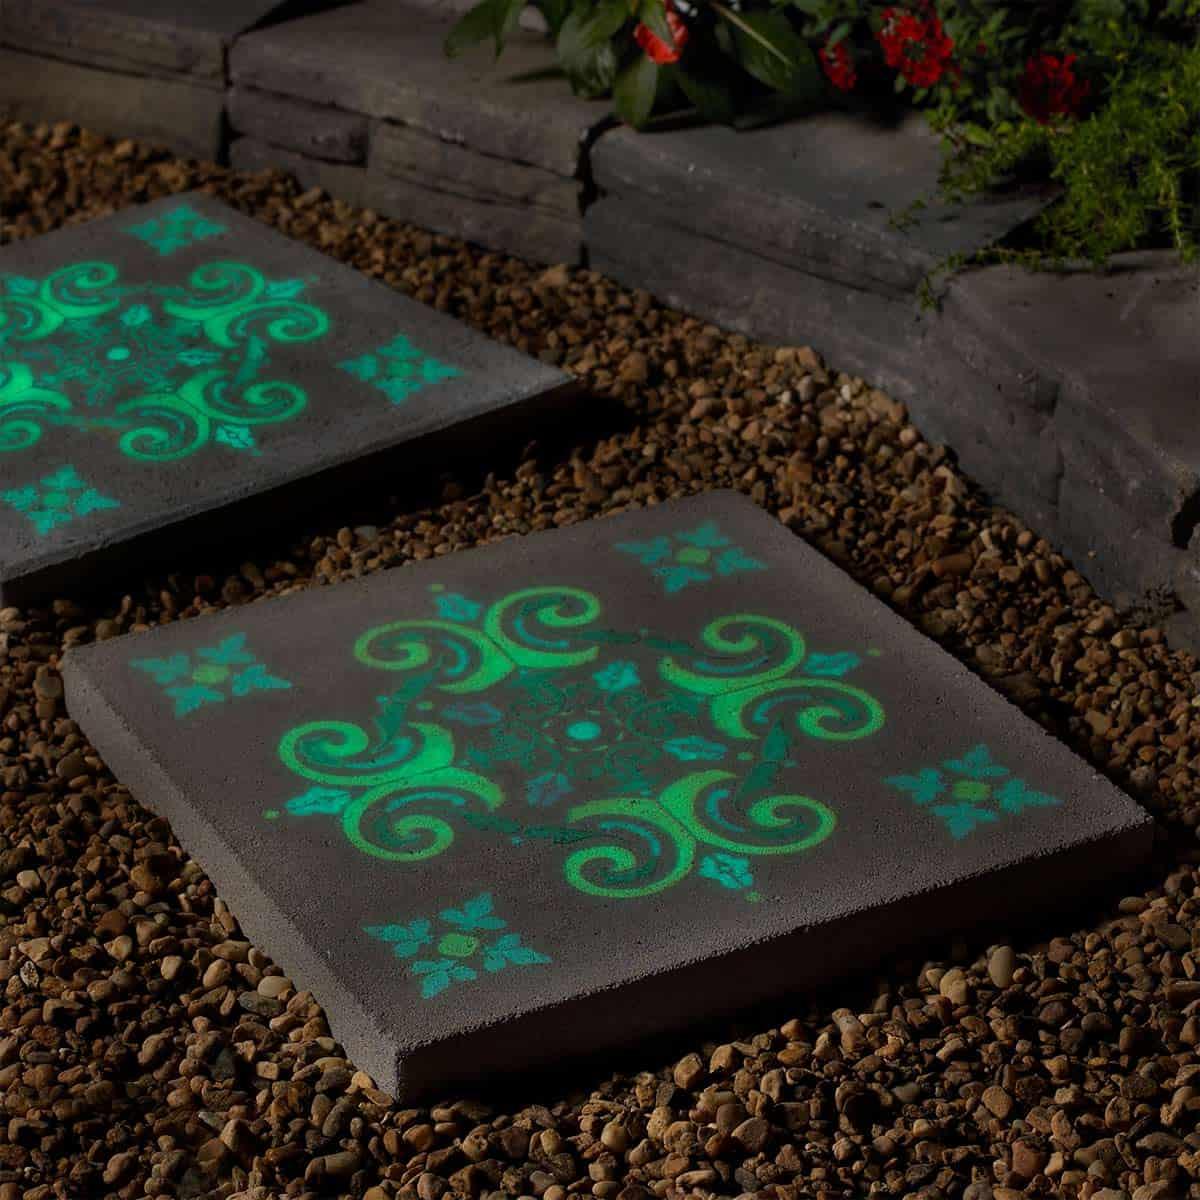 Glow in the dark stencil stepping stone